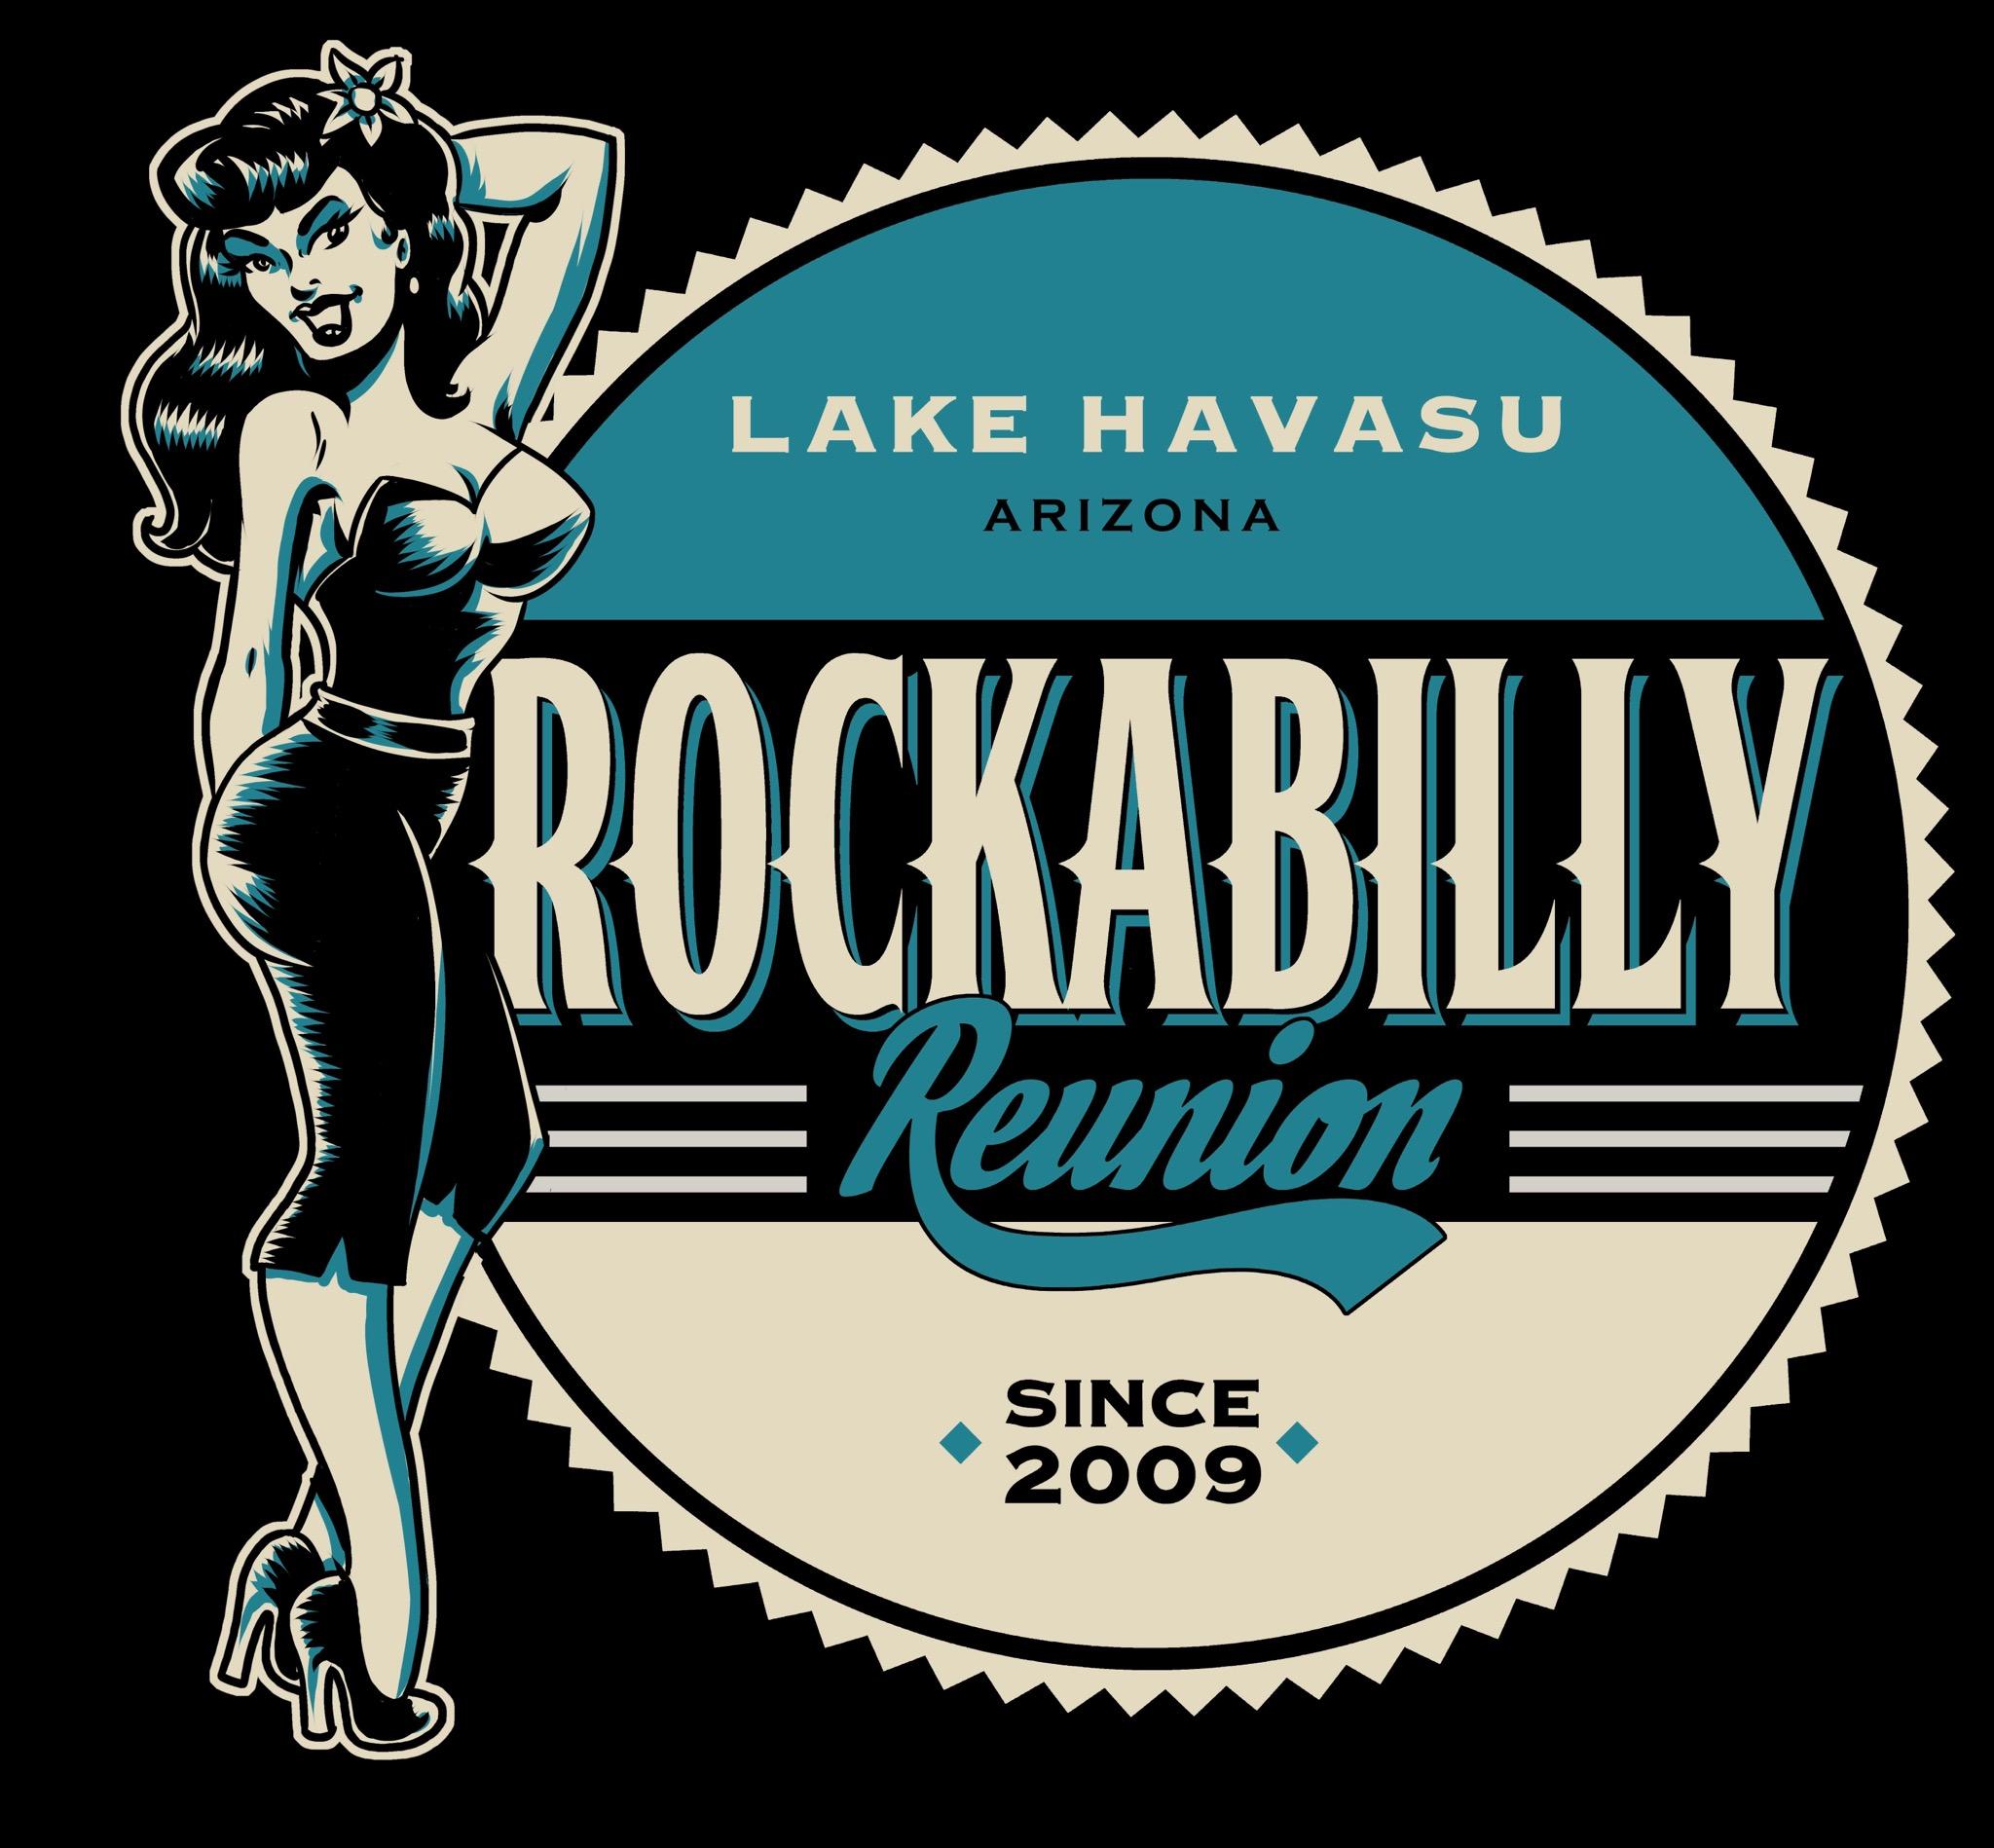 Lake Havasu Rockabilly Reunion